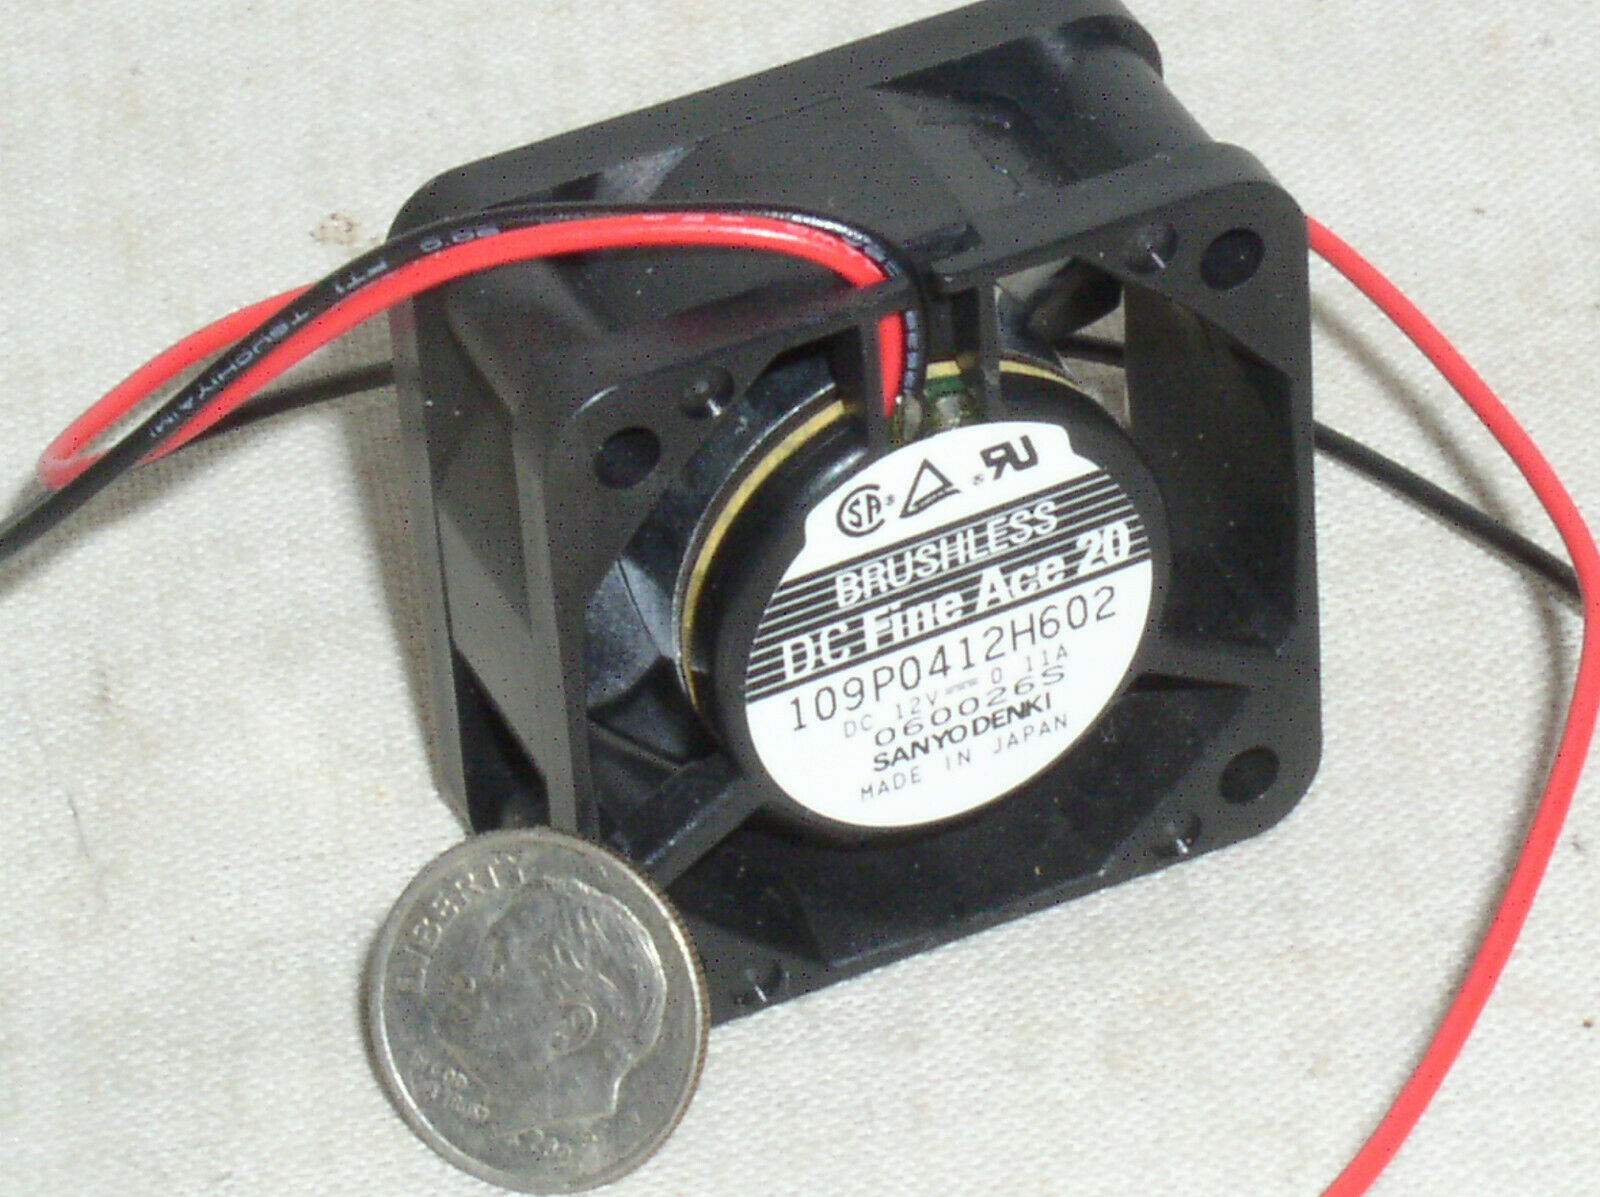 SANYO DENKI 24VDC 0.07A BRUSHLESS COOLING FAN 109P0424H6D04 *LOT OF 3*